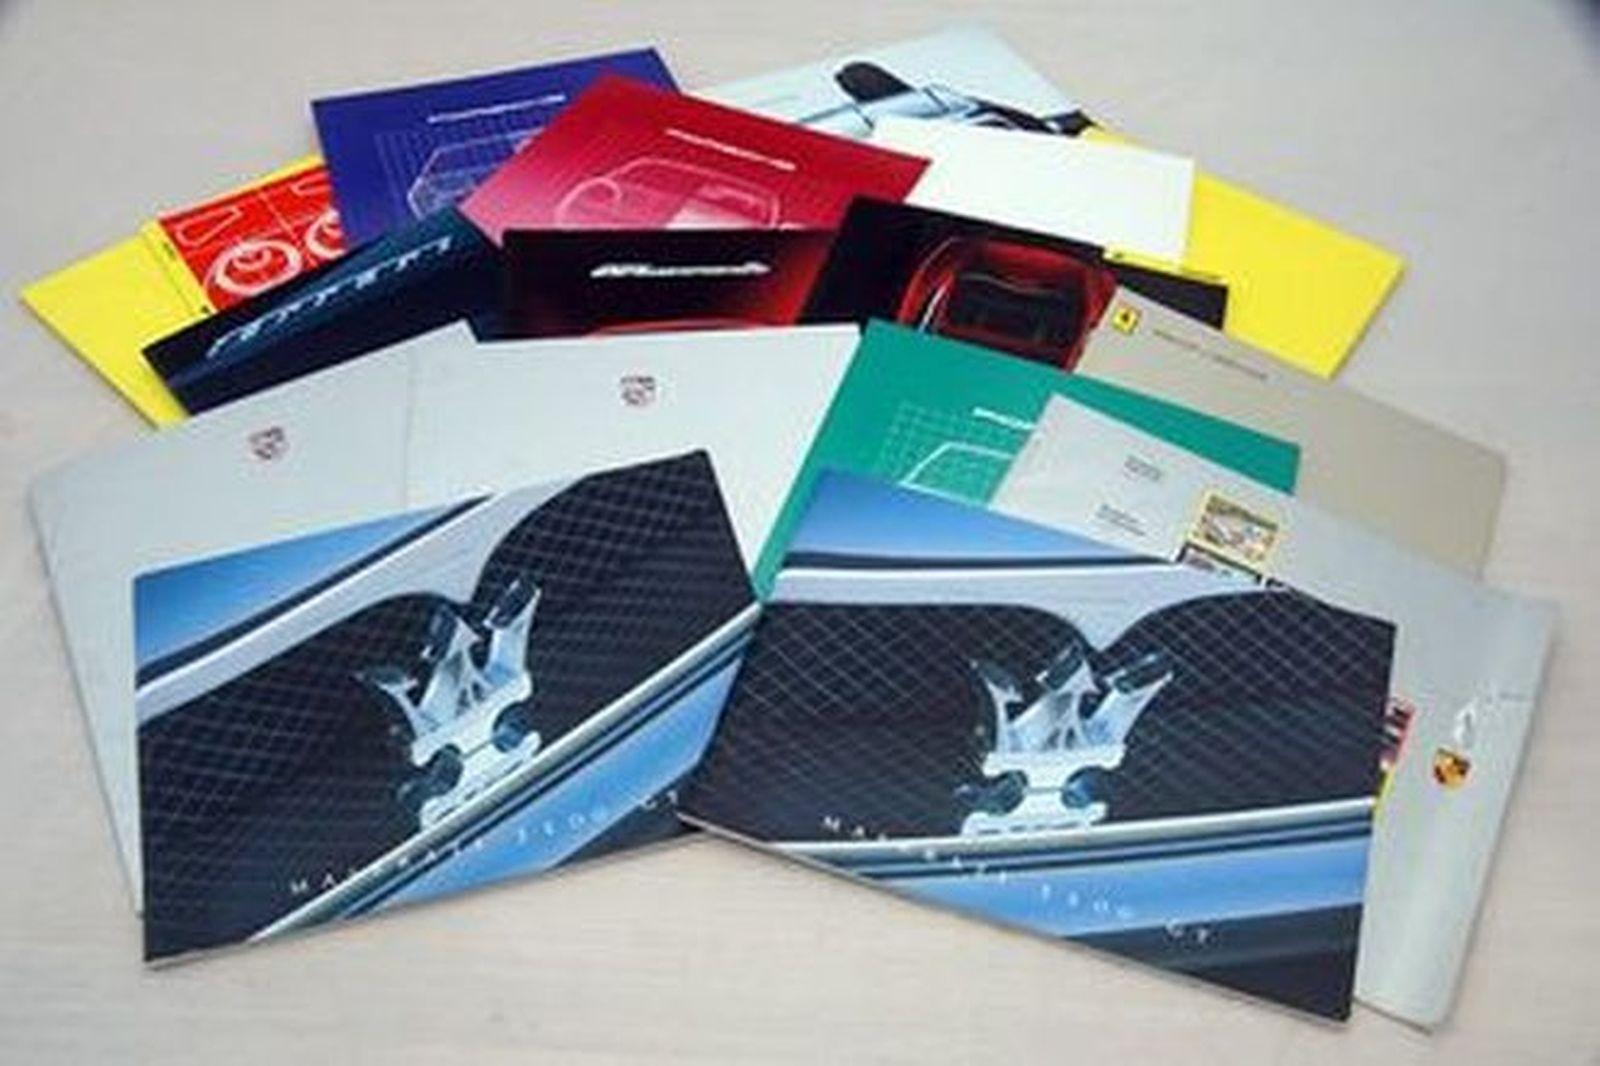 Advertising Brochures x 18 - Assorted Maserati , Porsche and Ferrari Brochures